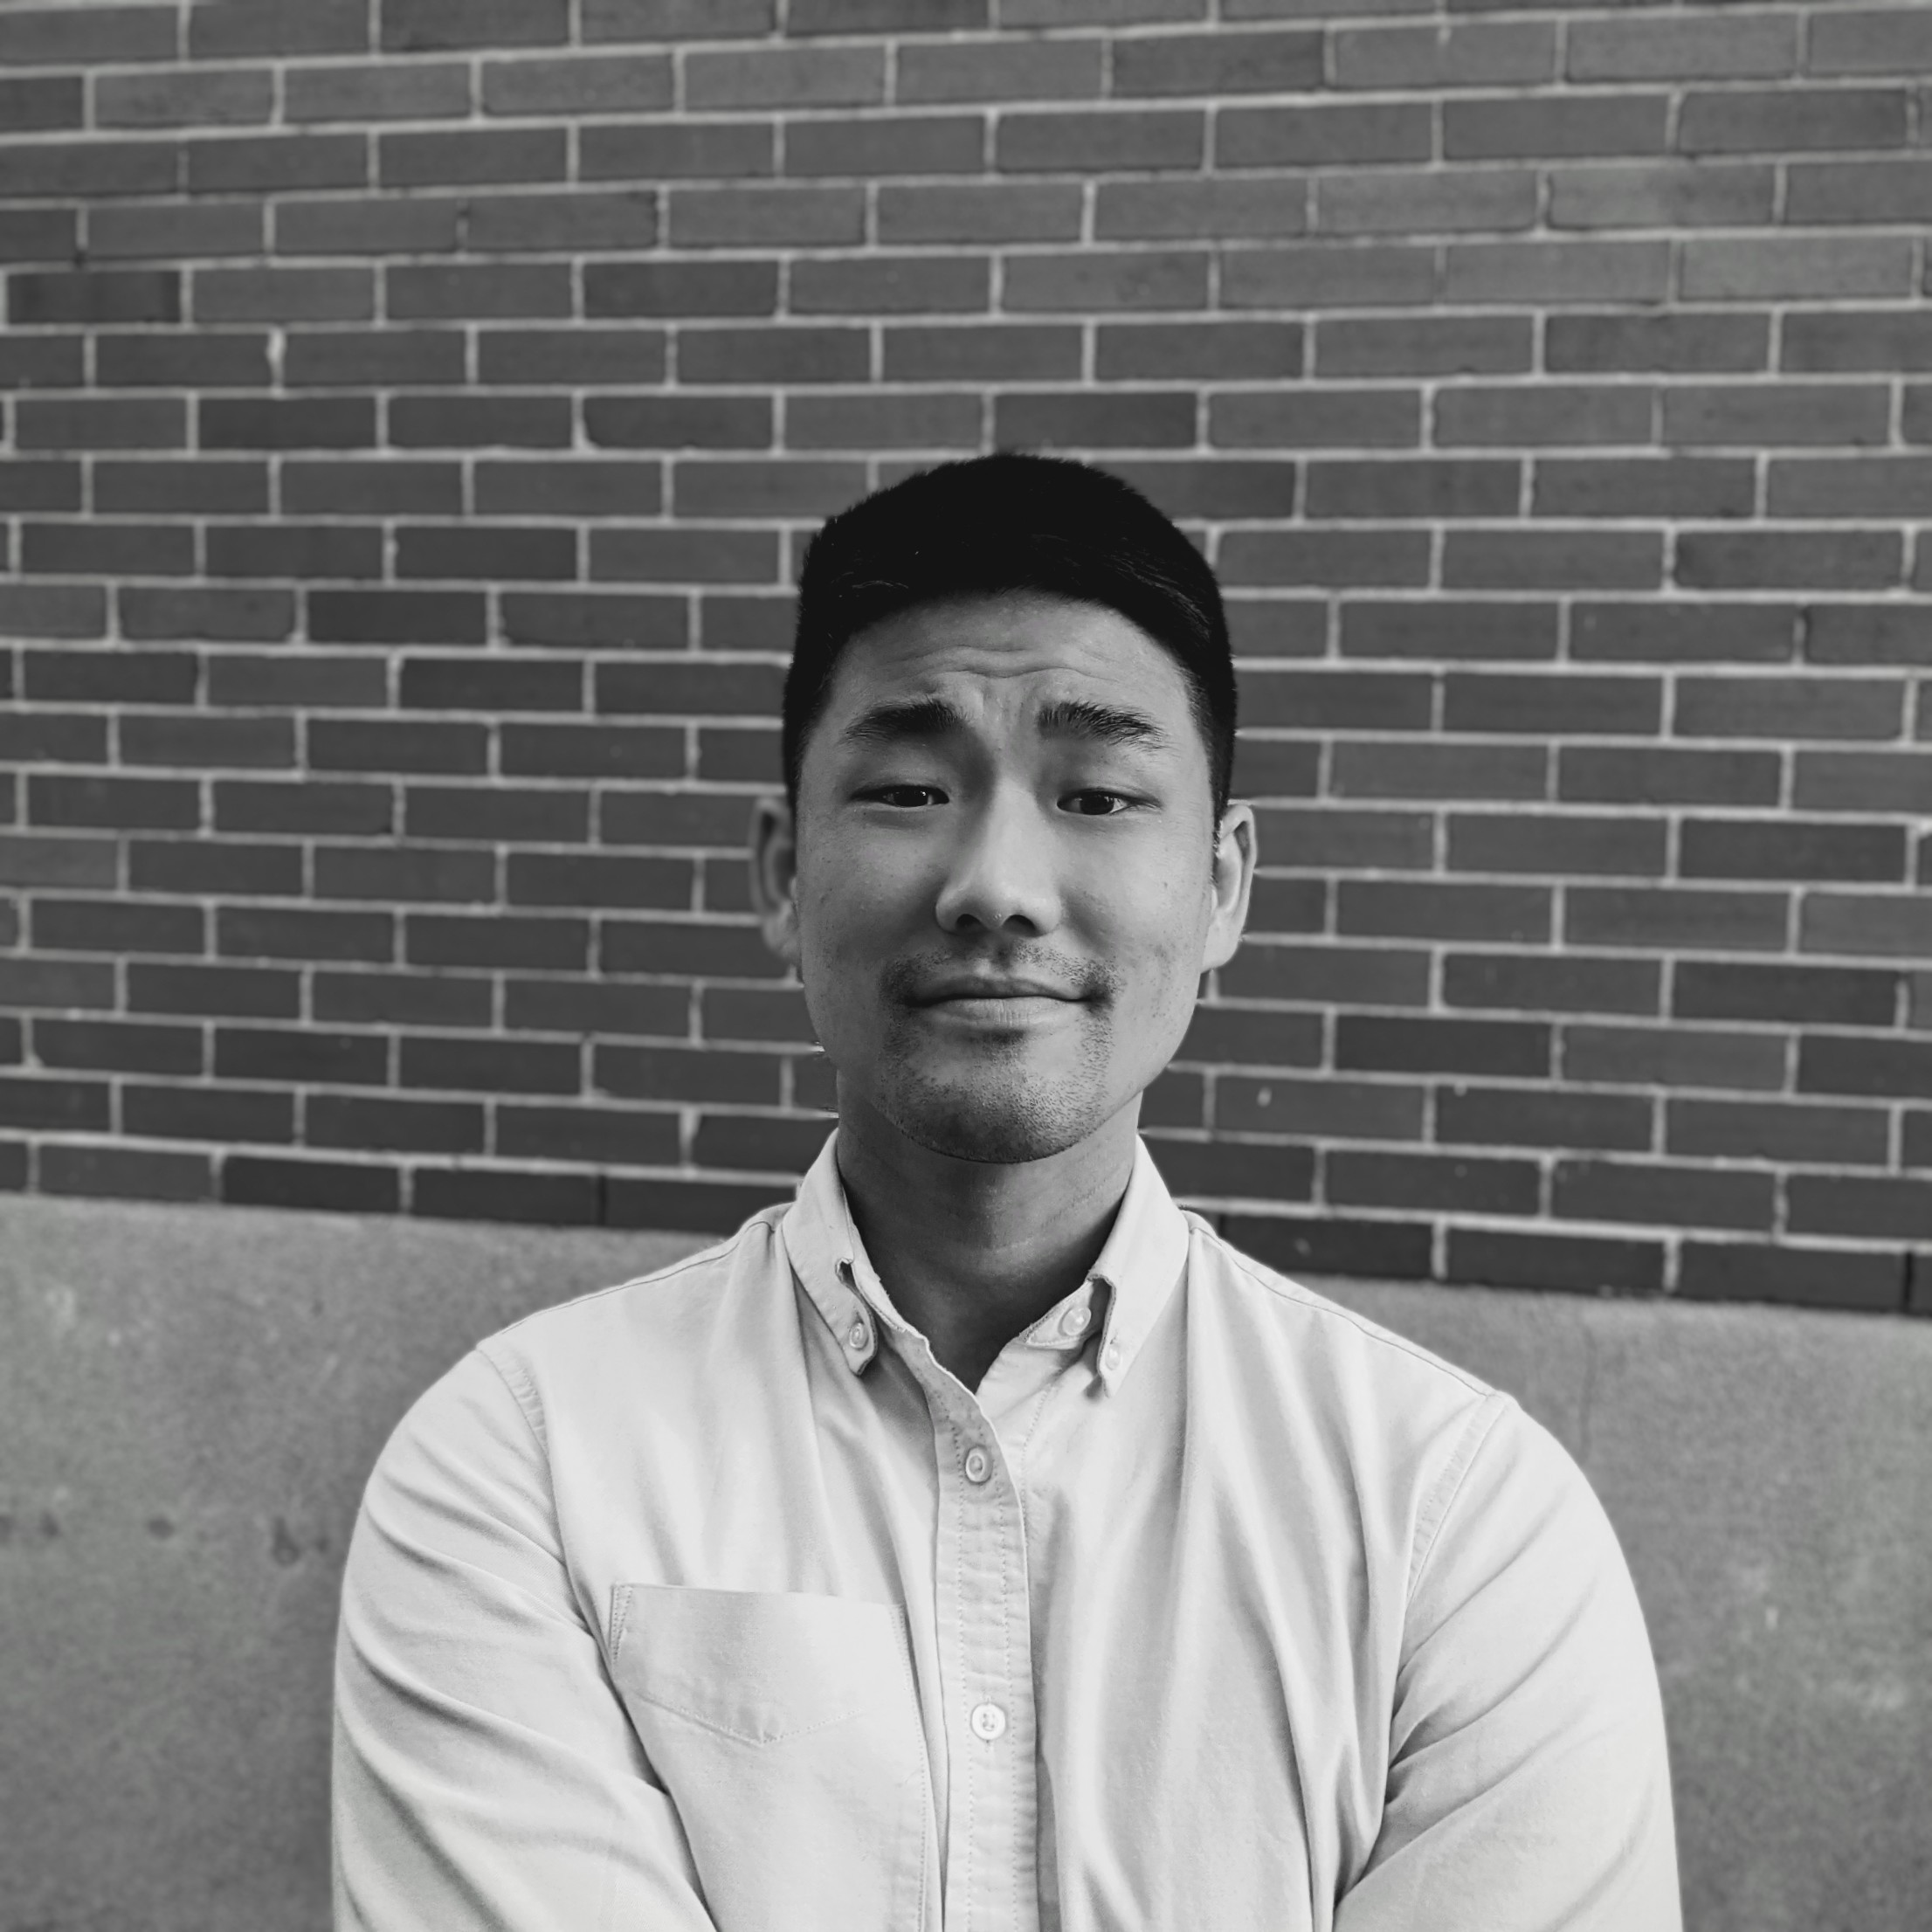 Joshua Jung